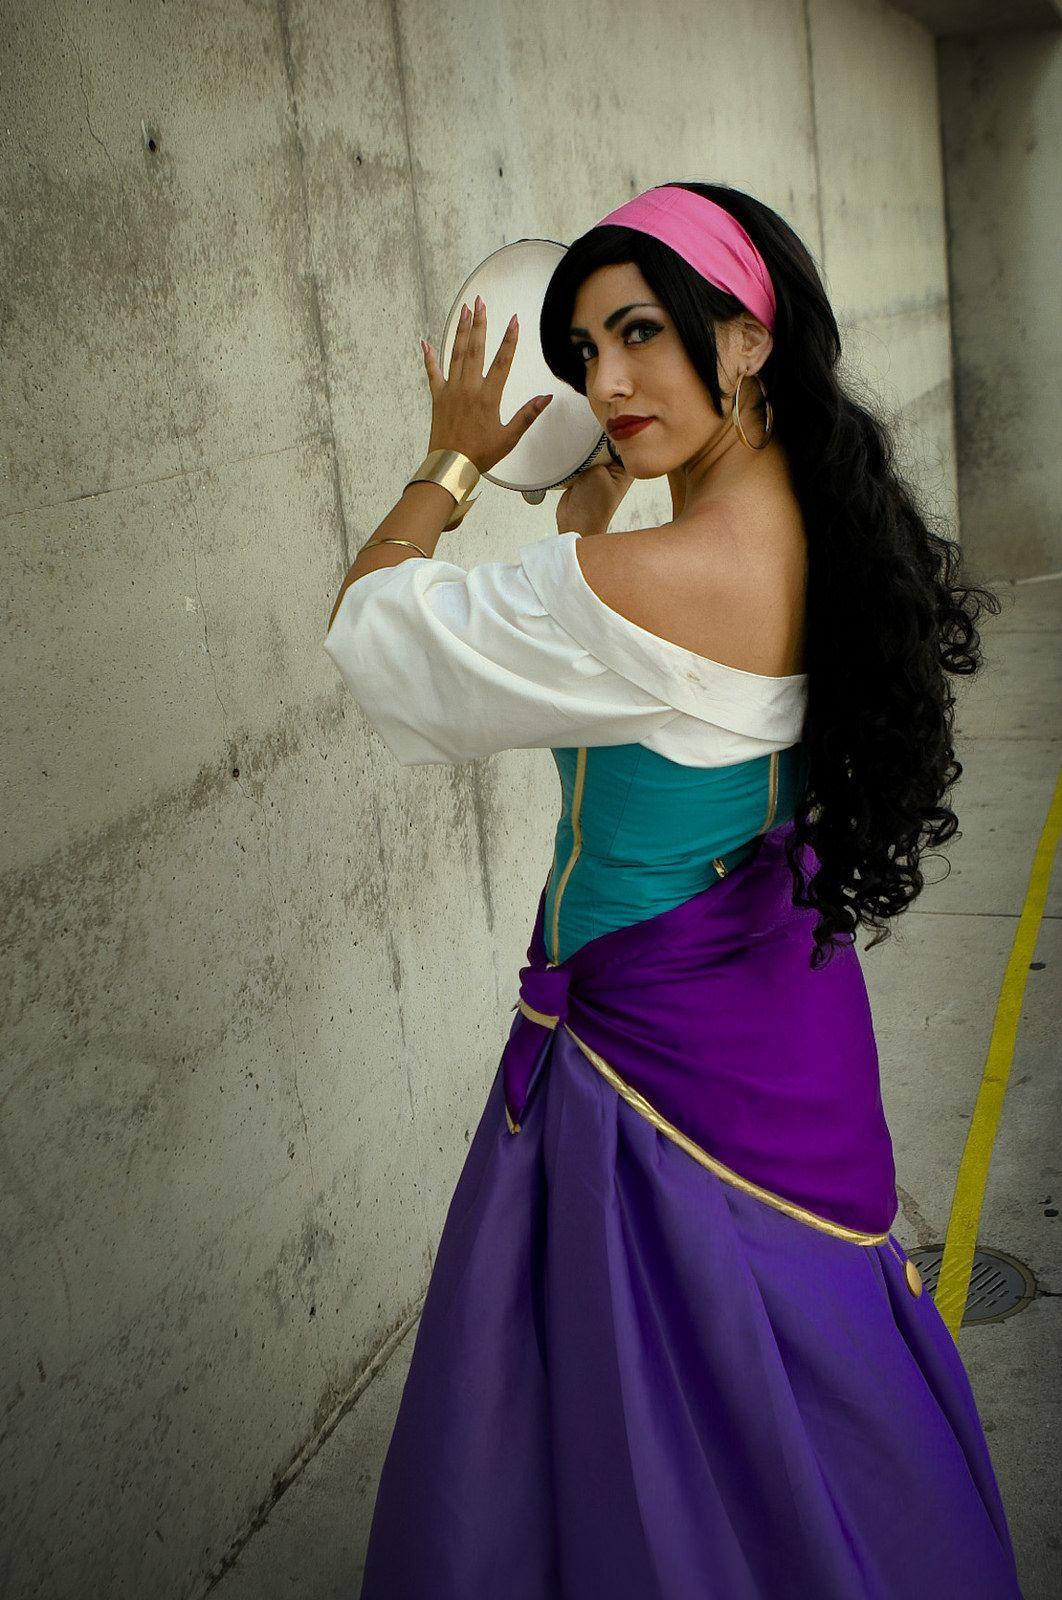 Esmeralda (The Hunchback of Notre Dame) #AnimeExpo2015. Disney Princess CosplayDisney CosplayGypsy ...  sc 1 st  Pinterest & Anime Expo 2015: Esmeralda (The Hunchback of Notre Dame) | Cosplay ...